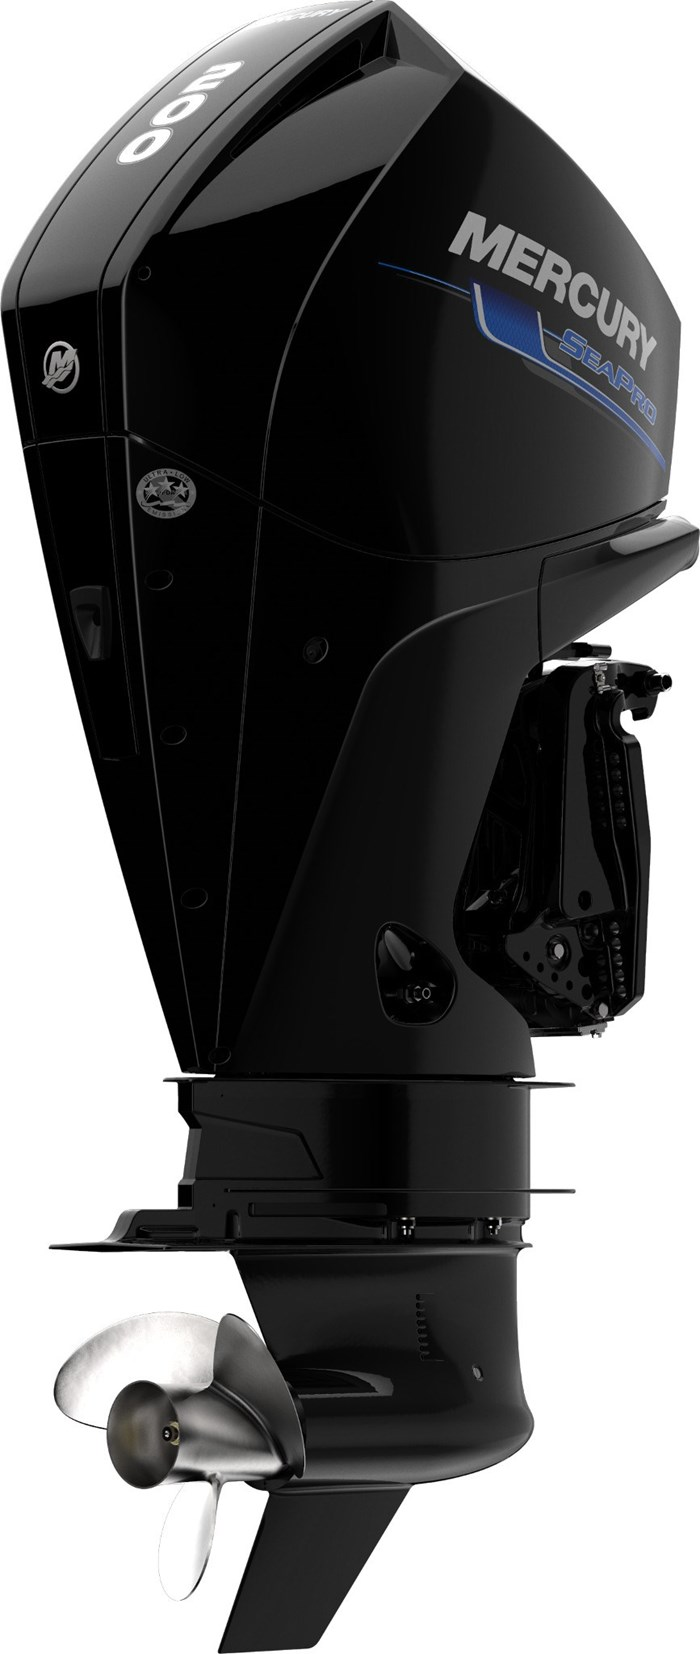 2020 Mercury 200XL V-6 4-Stroke SeaPro Commercial Outboard Photo 6 of 22